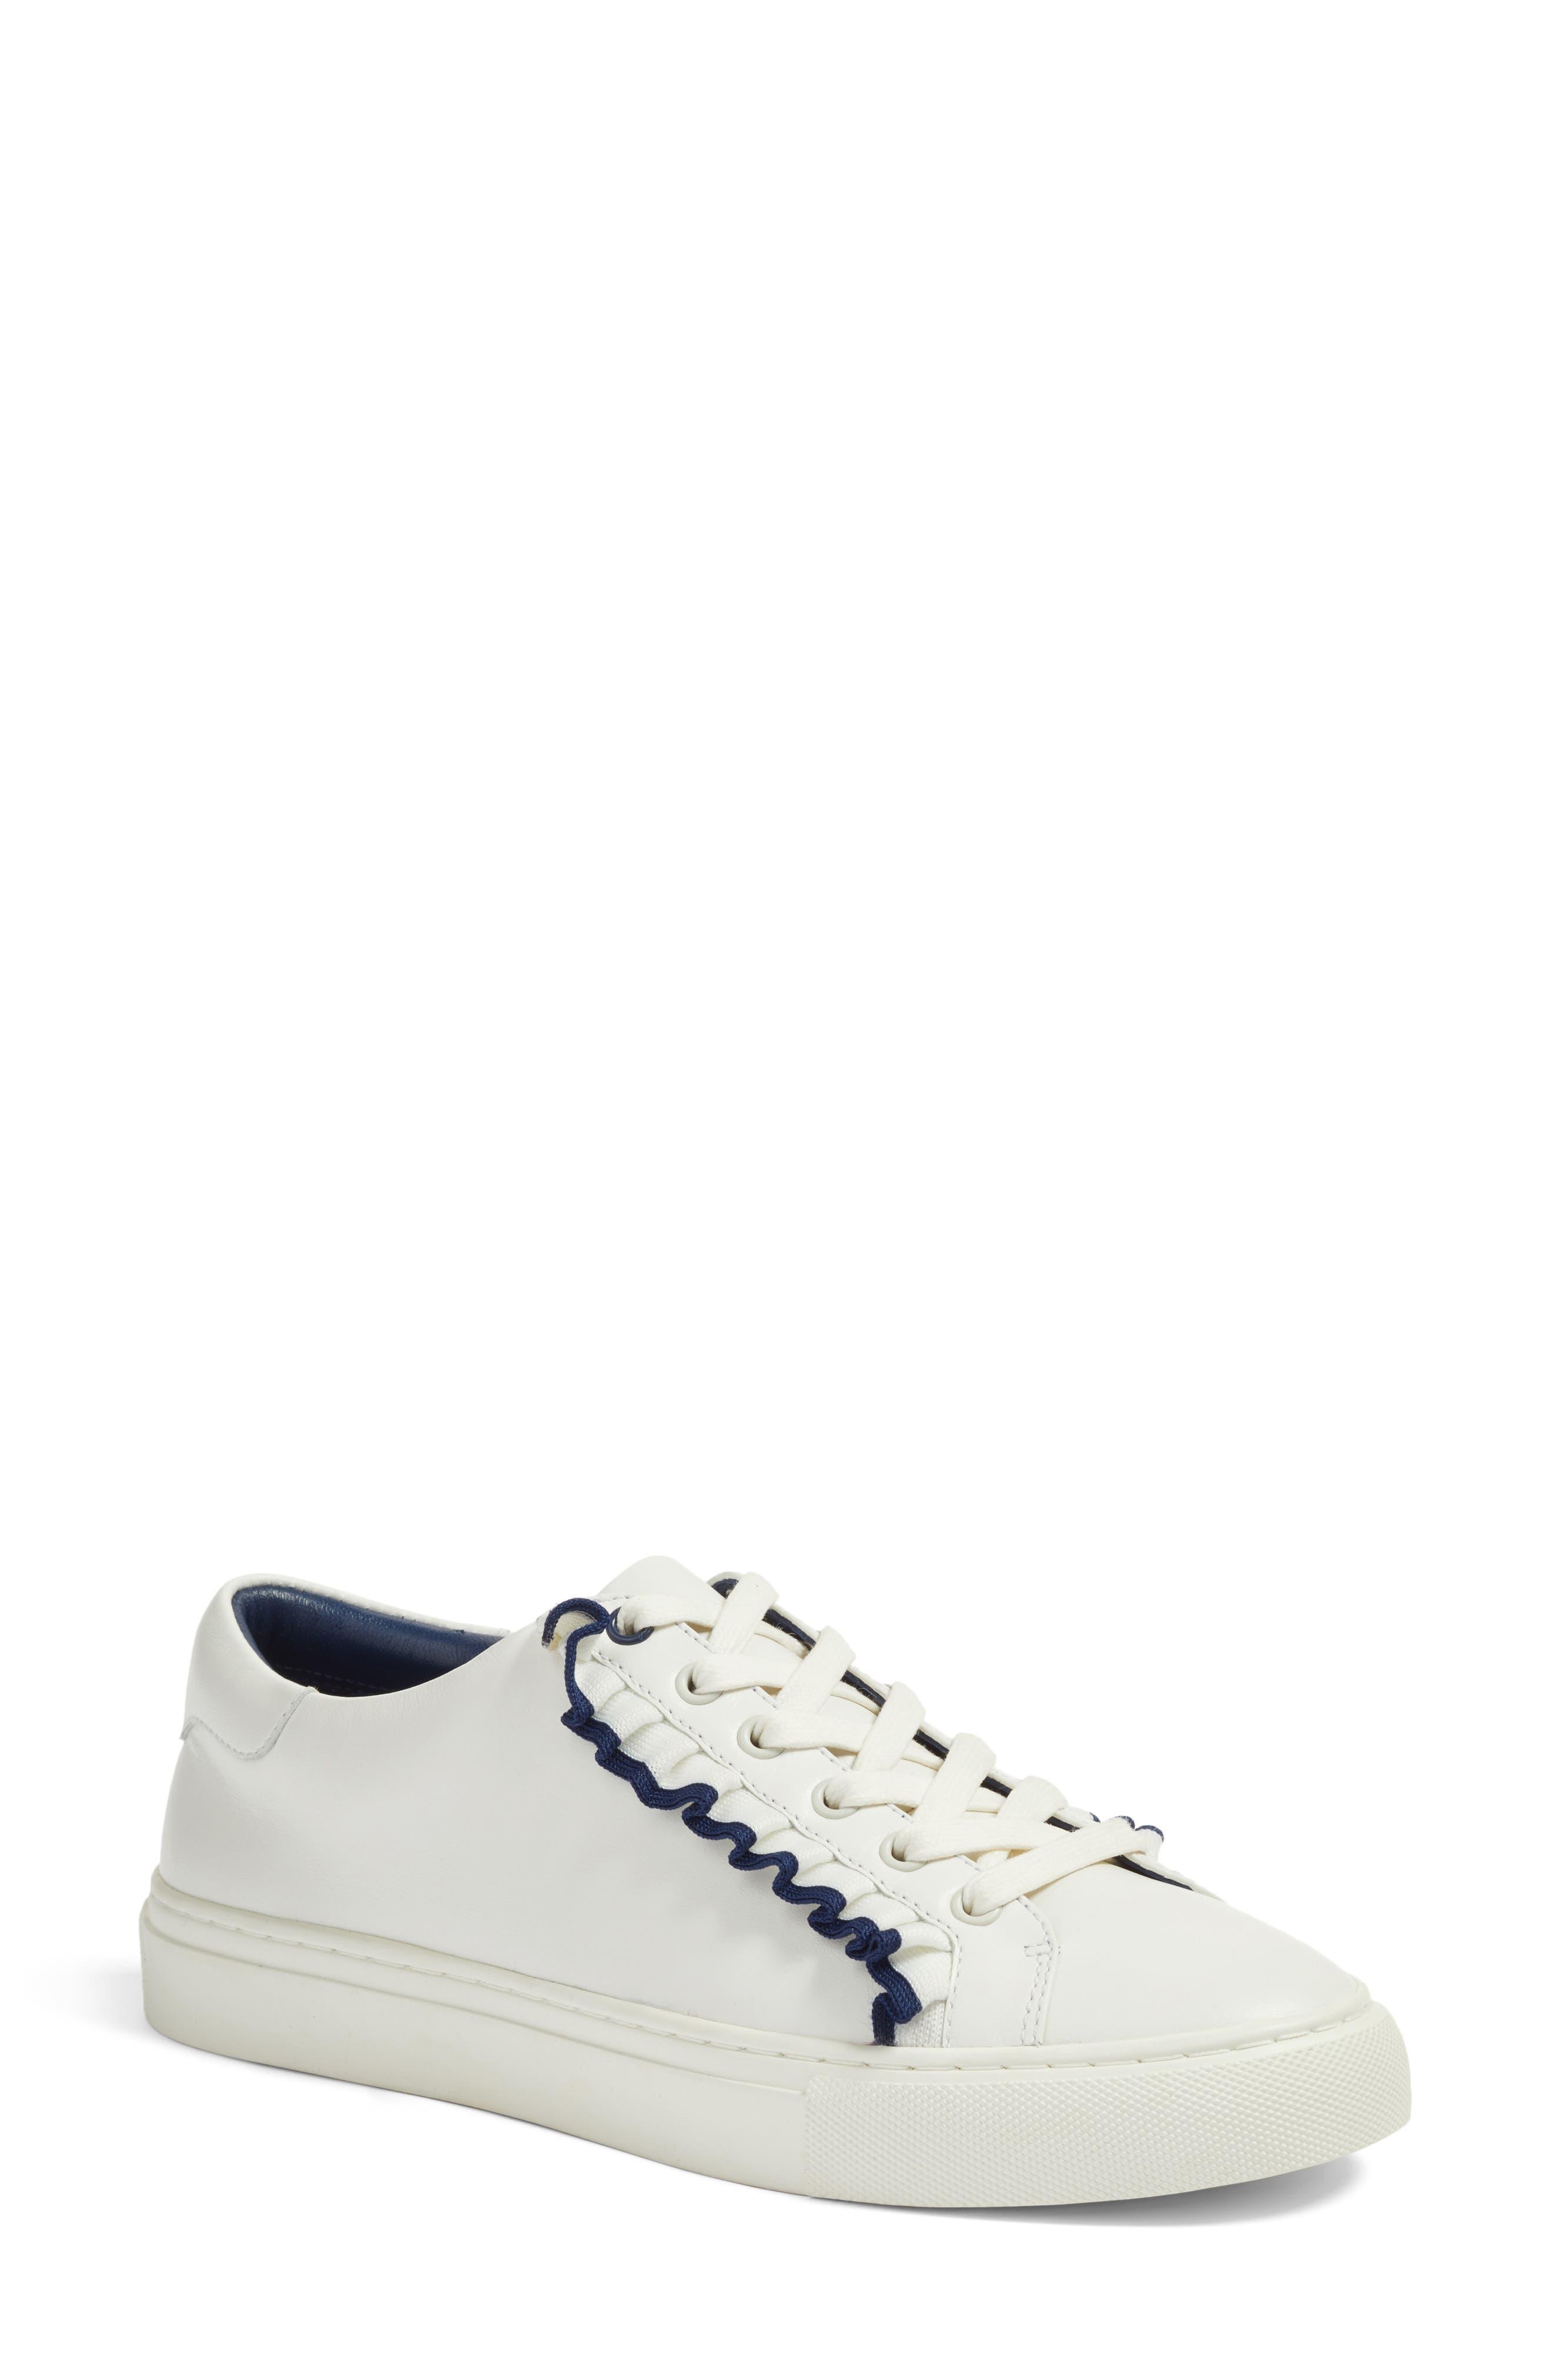 Ruffle Sneaker,                         Main,                         color, Snow White/ Navy Sea